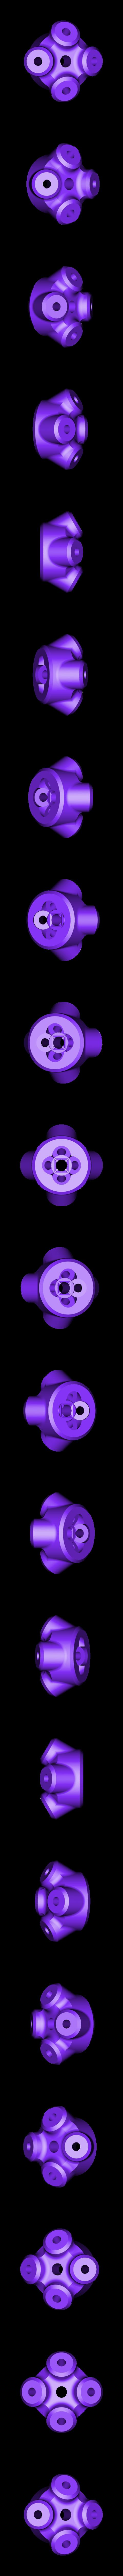 FOLDING_GRAPPLE_8MM.stl Download free STL file FOLDING GRAPPLE HOOK • 3D printing design, MuSSy